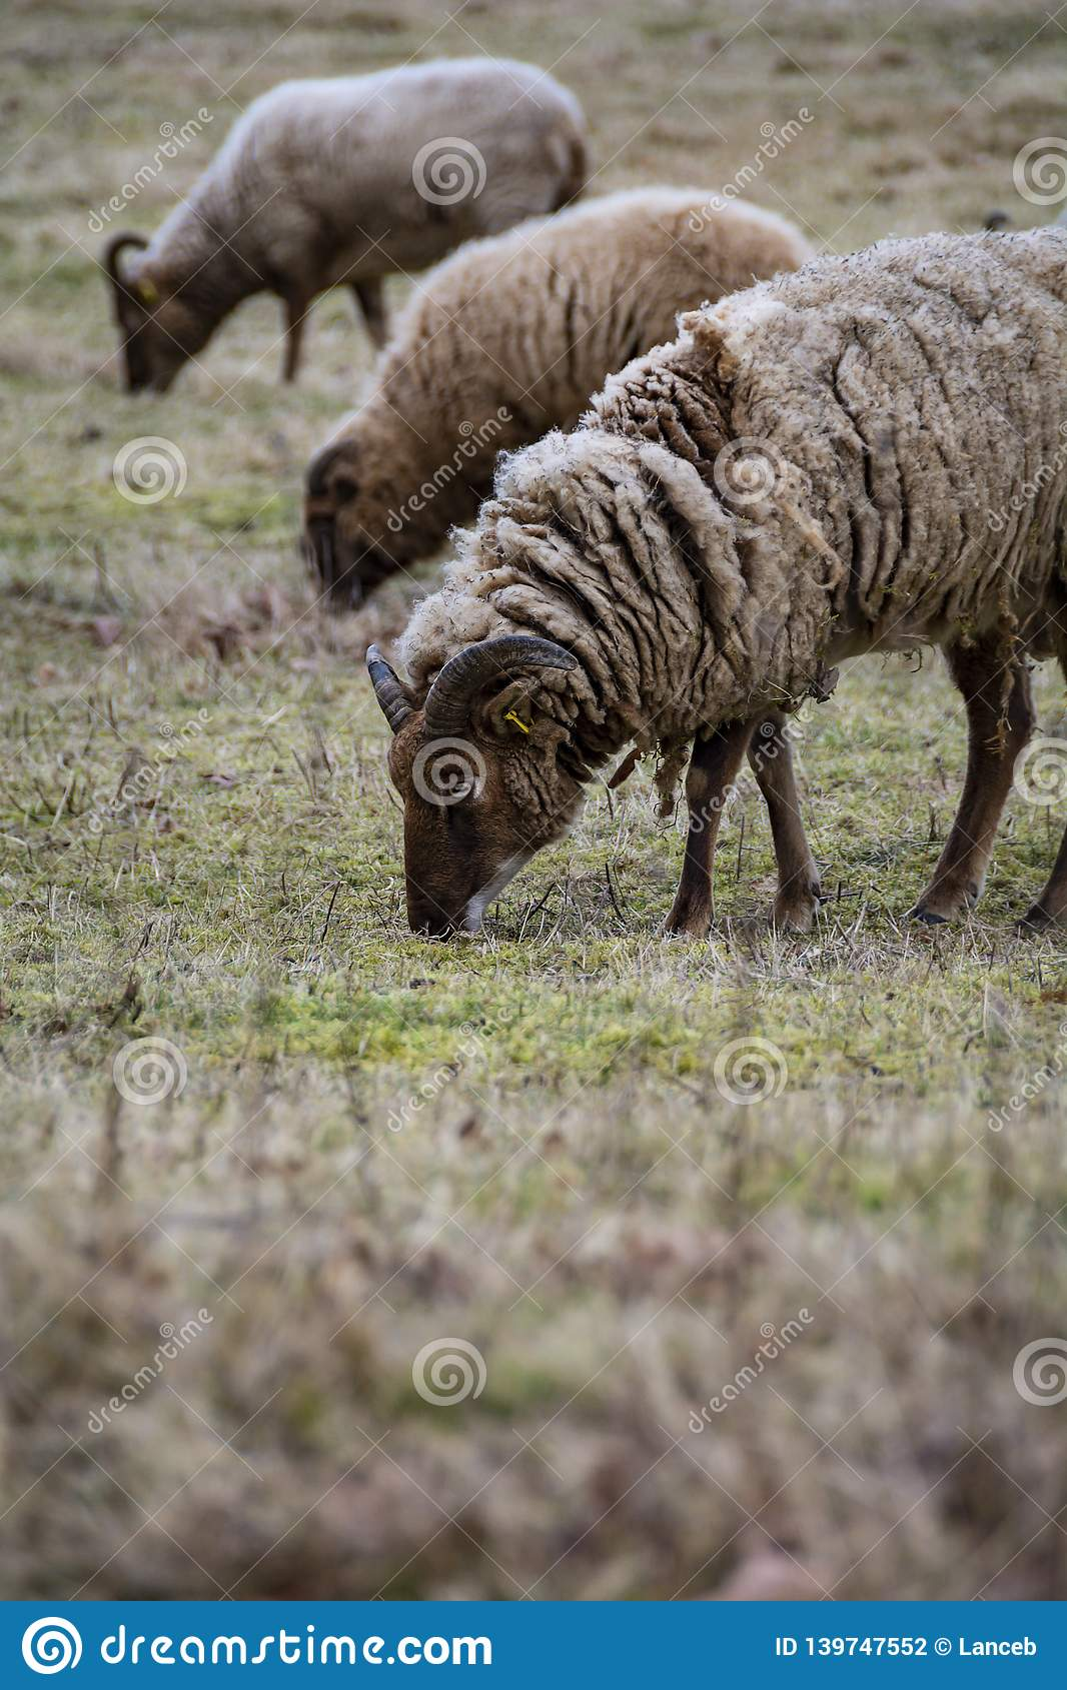 Rare breed of sheep grazing on grassland